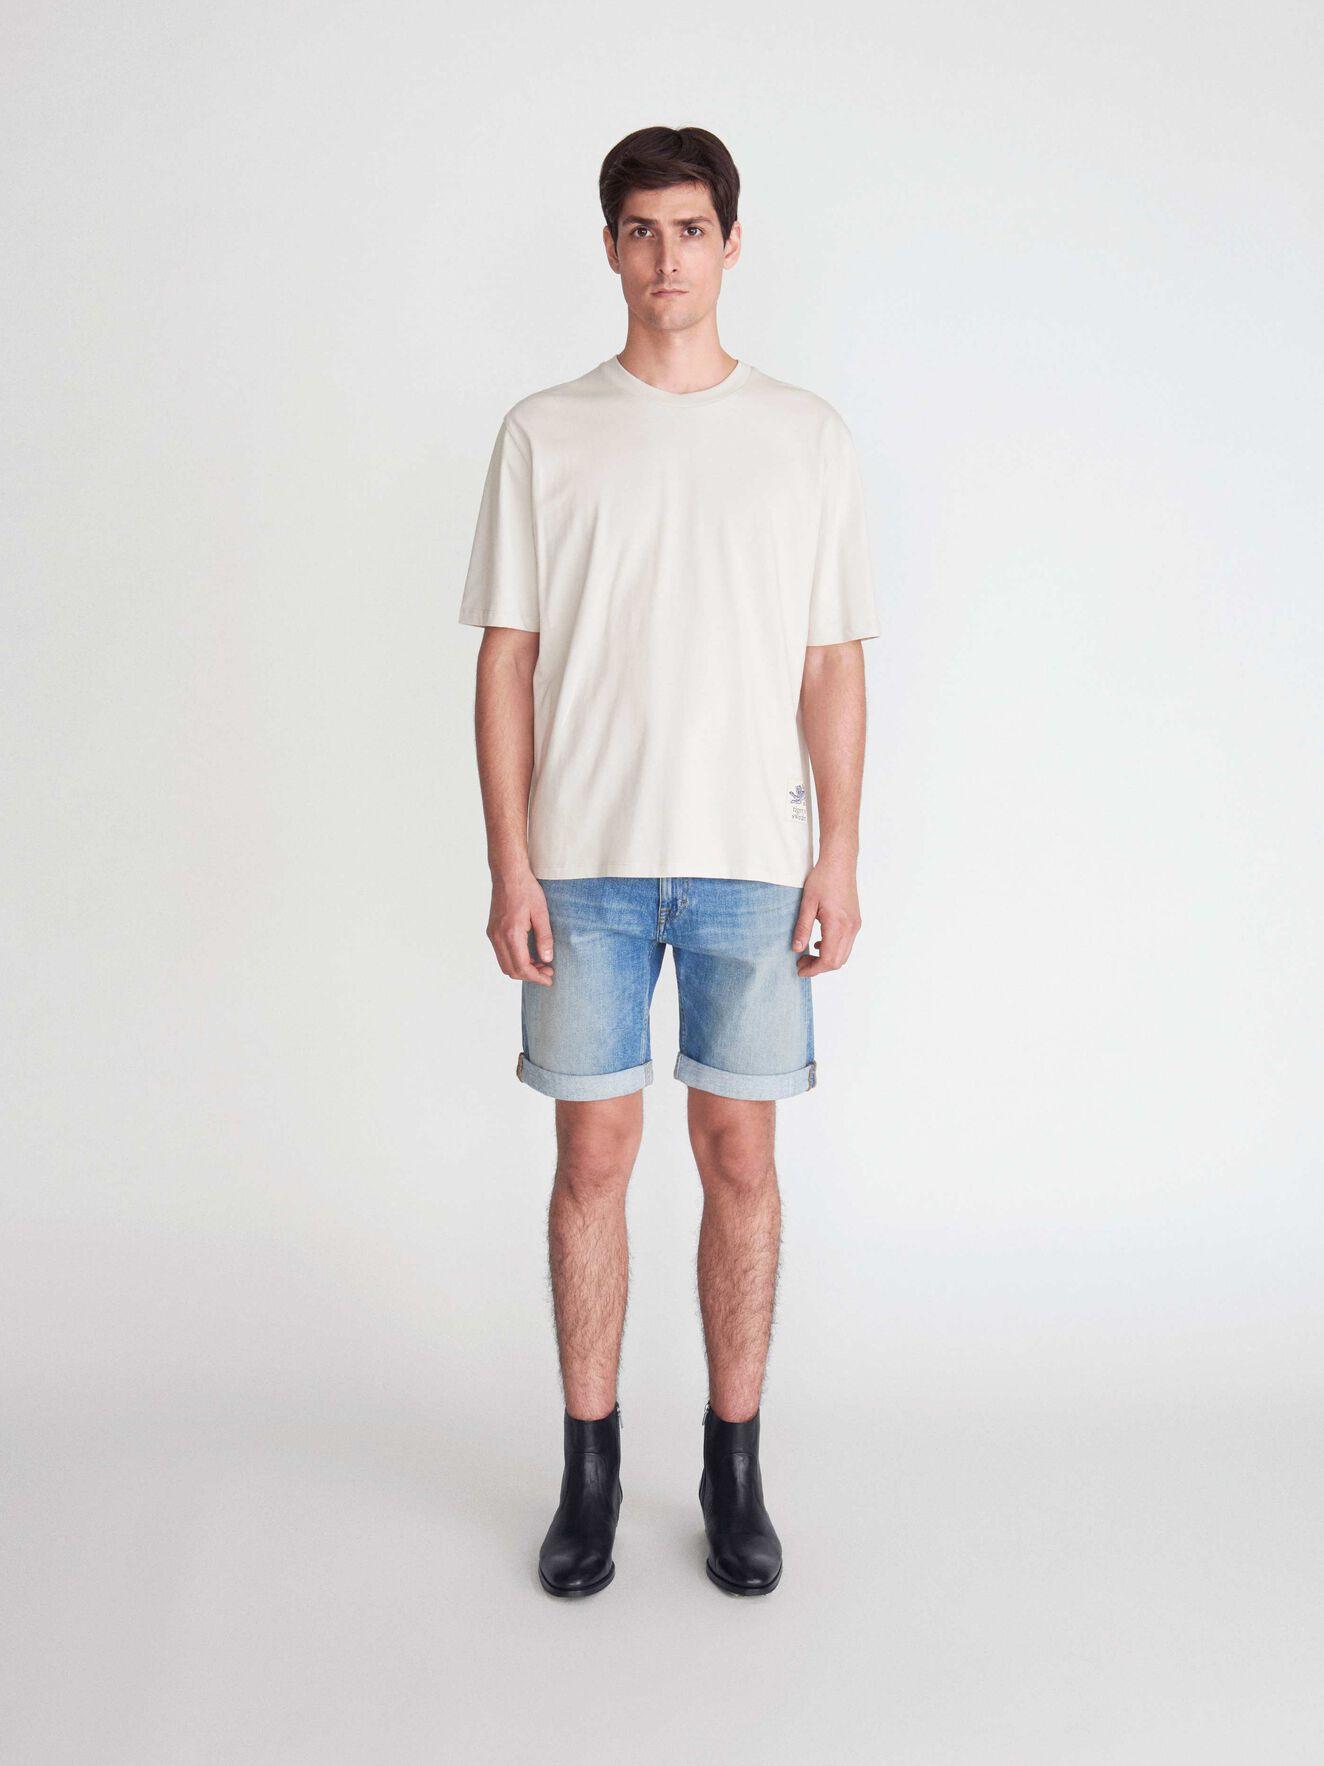 d7dd984d4 Jeans - Buy designer T-shirts in Tiger of Sweden s jeans collection